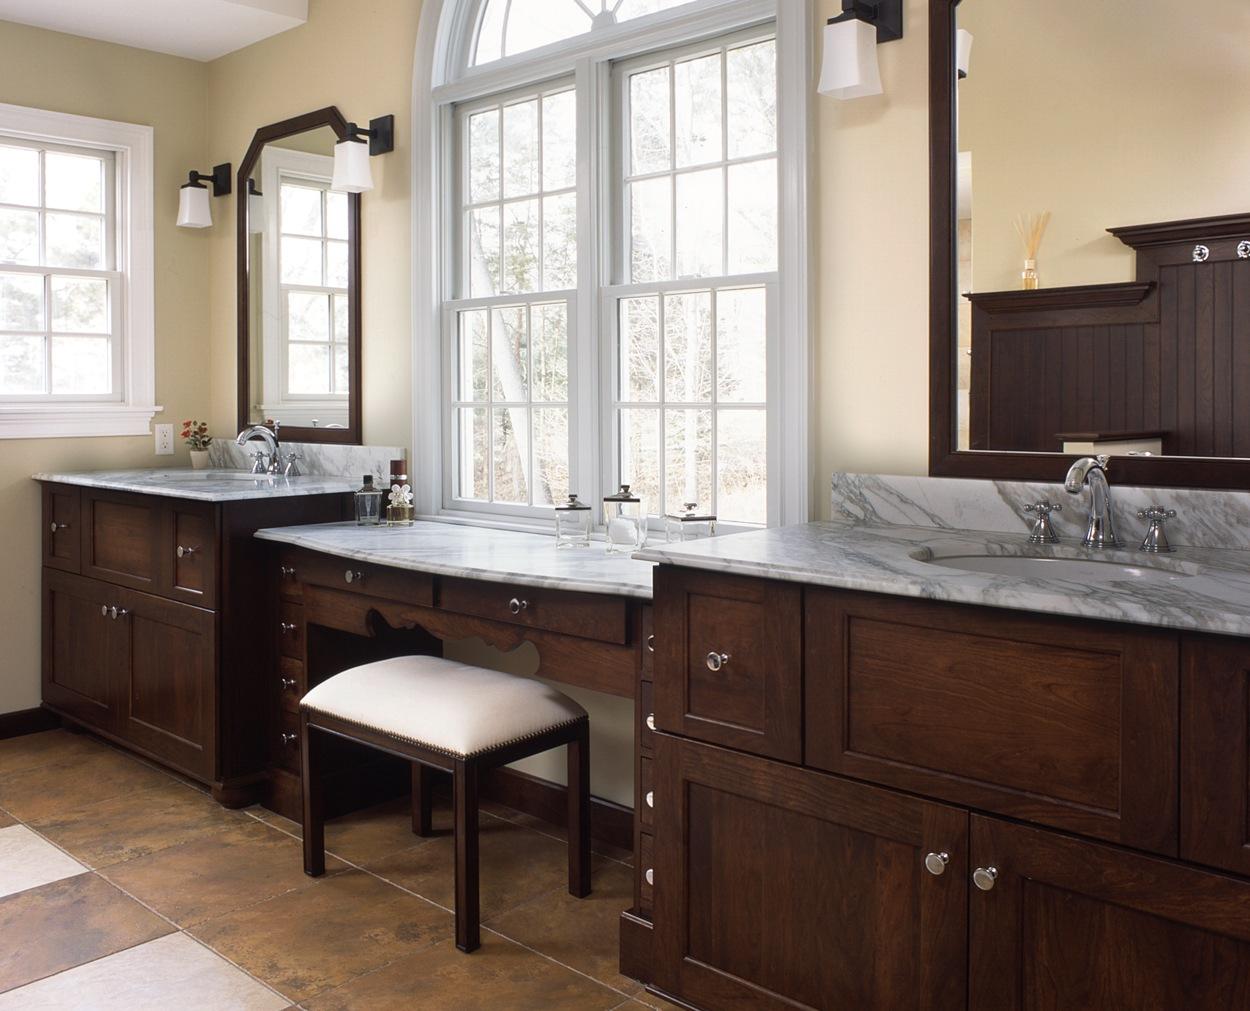 Dual vanities with a makeup area between in this Redding master bath renovation.